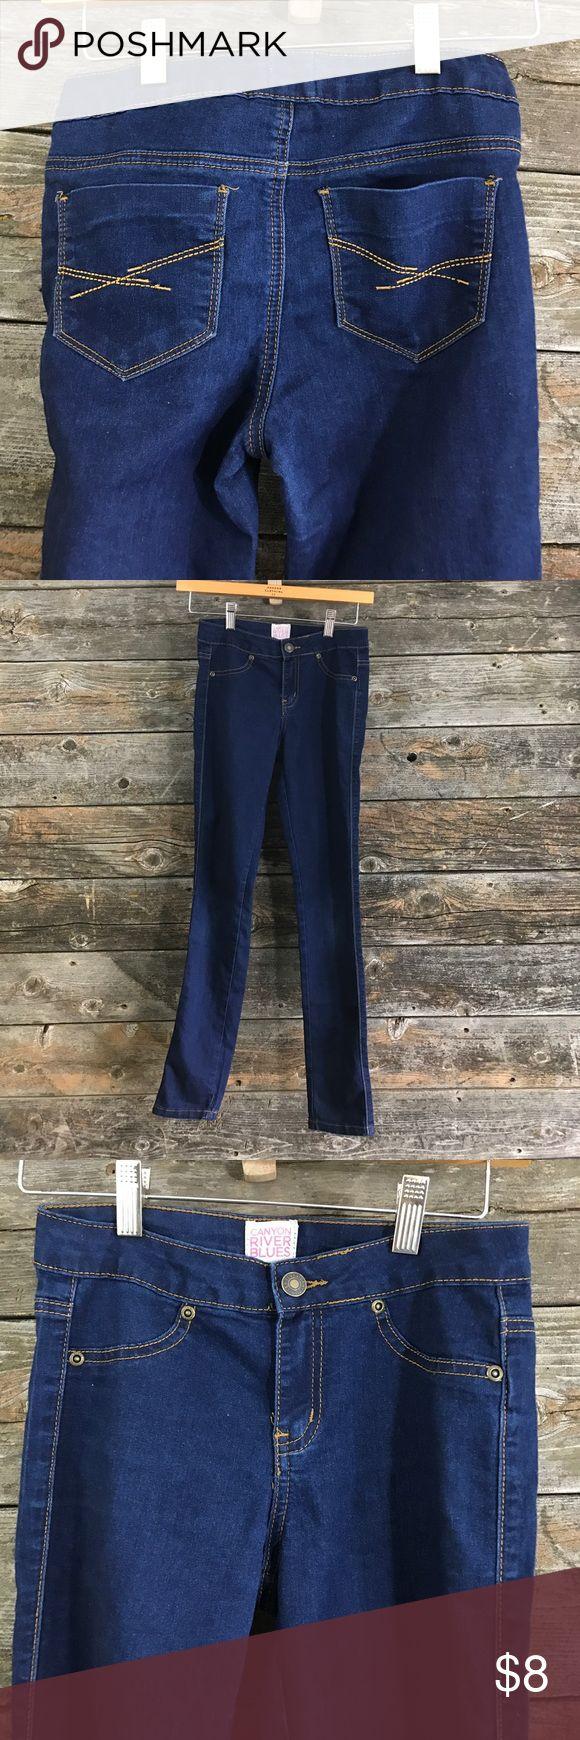 💜Sz 12 CANYON River Blues Jeggings Like new, dark blue jeggings. canyon river blues Bottoms Jeans